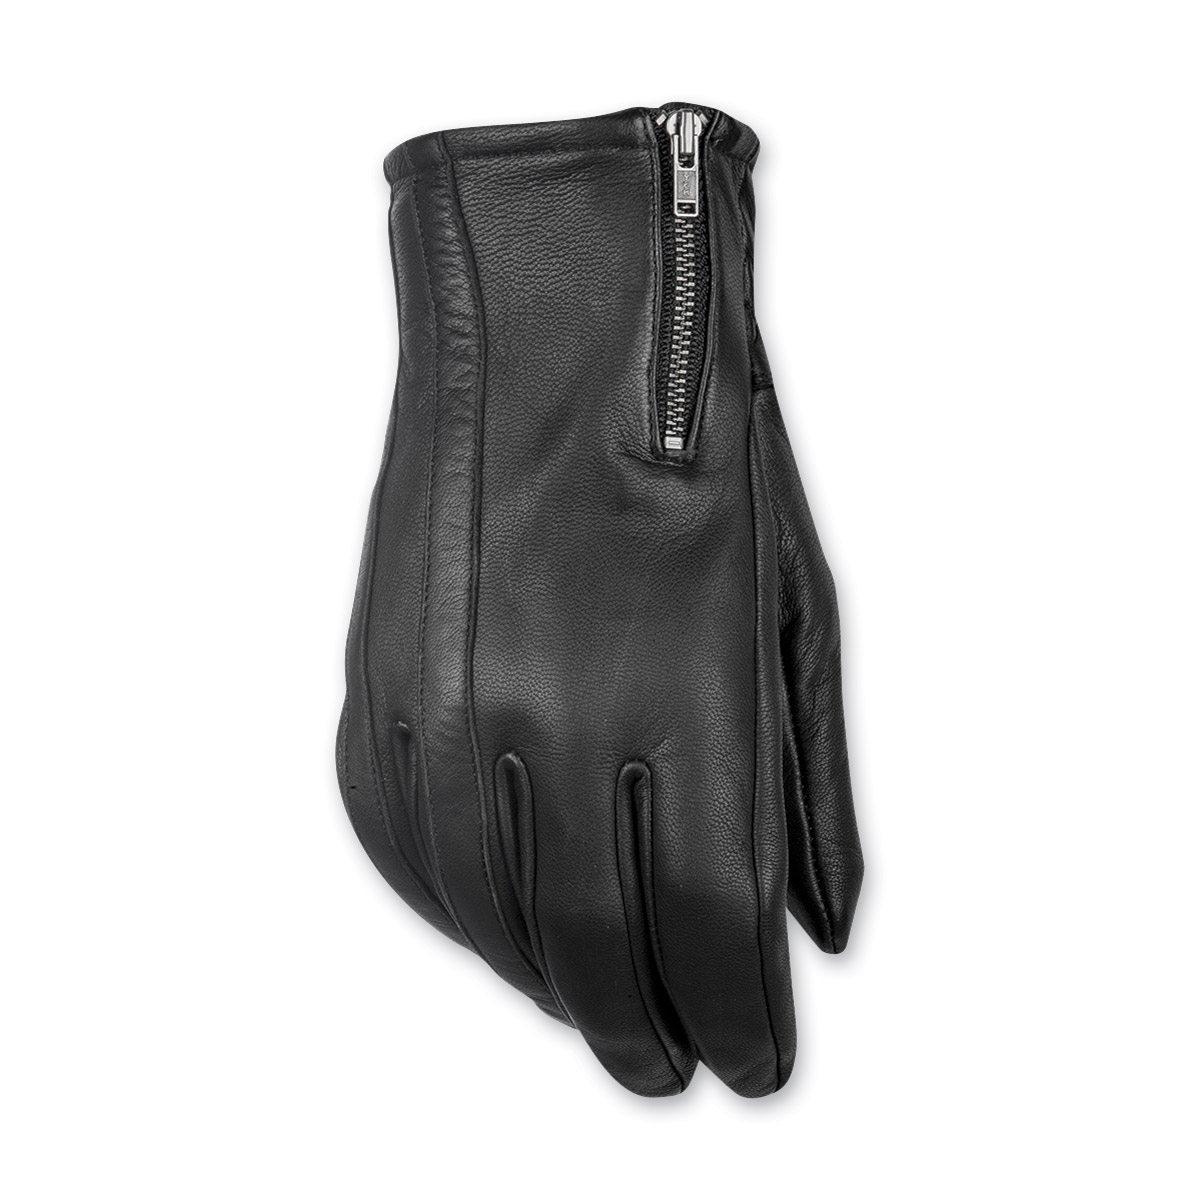 Highway 21 Men's Recoil Black Leather Gloves